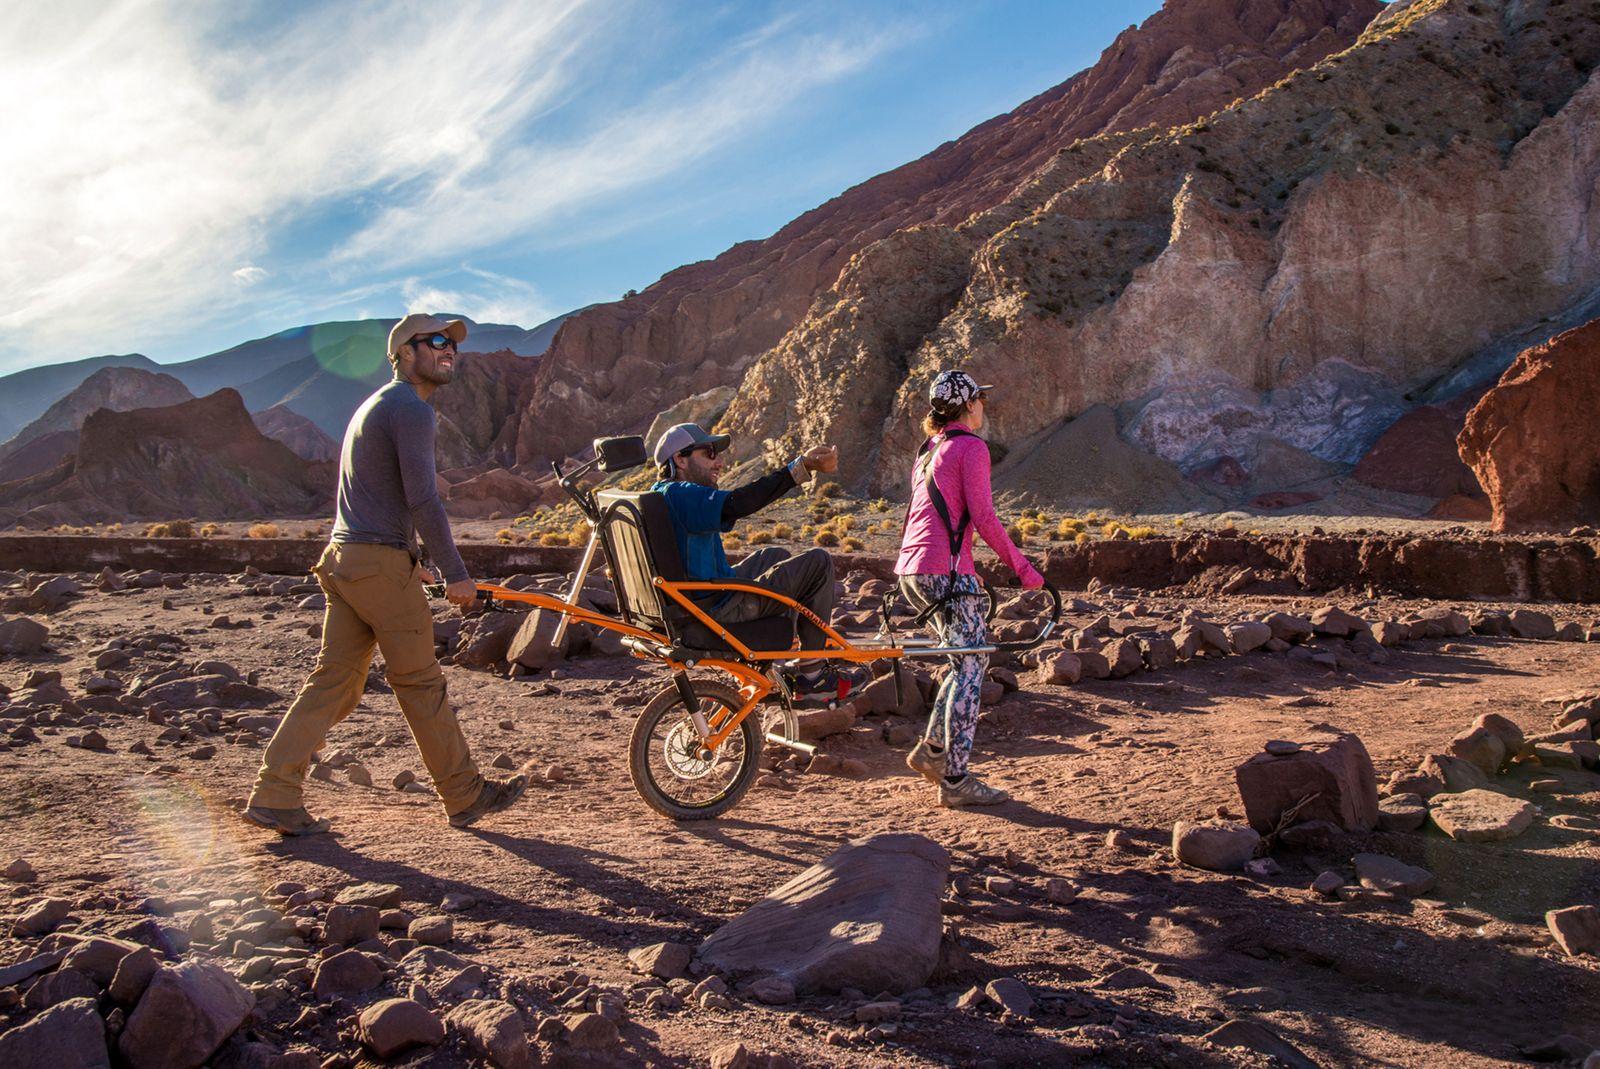 Gallery1 - Atacama desert